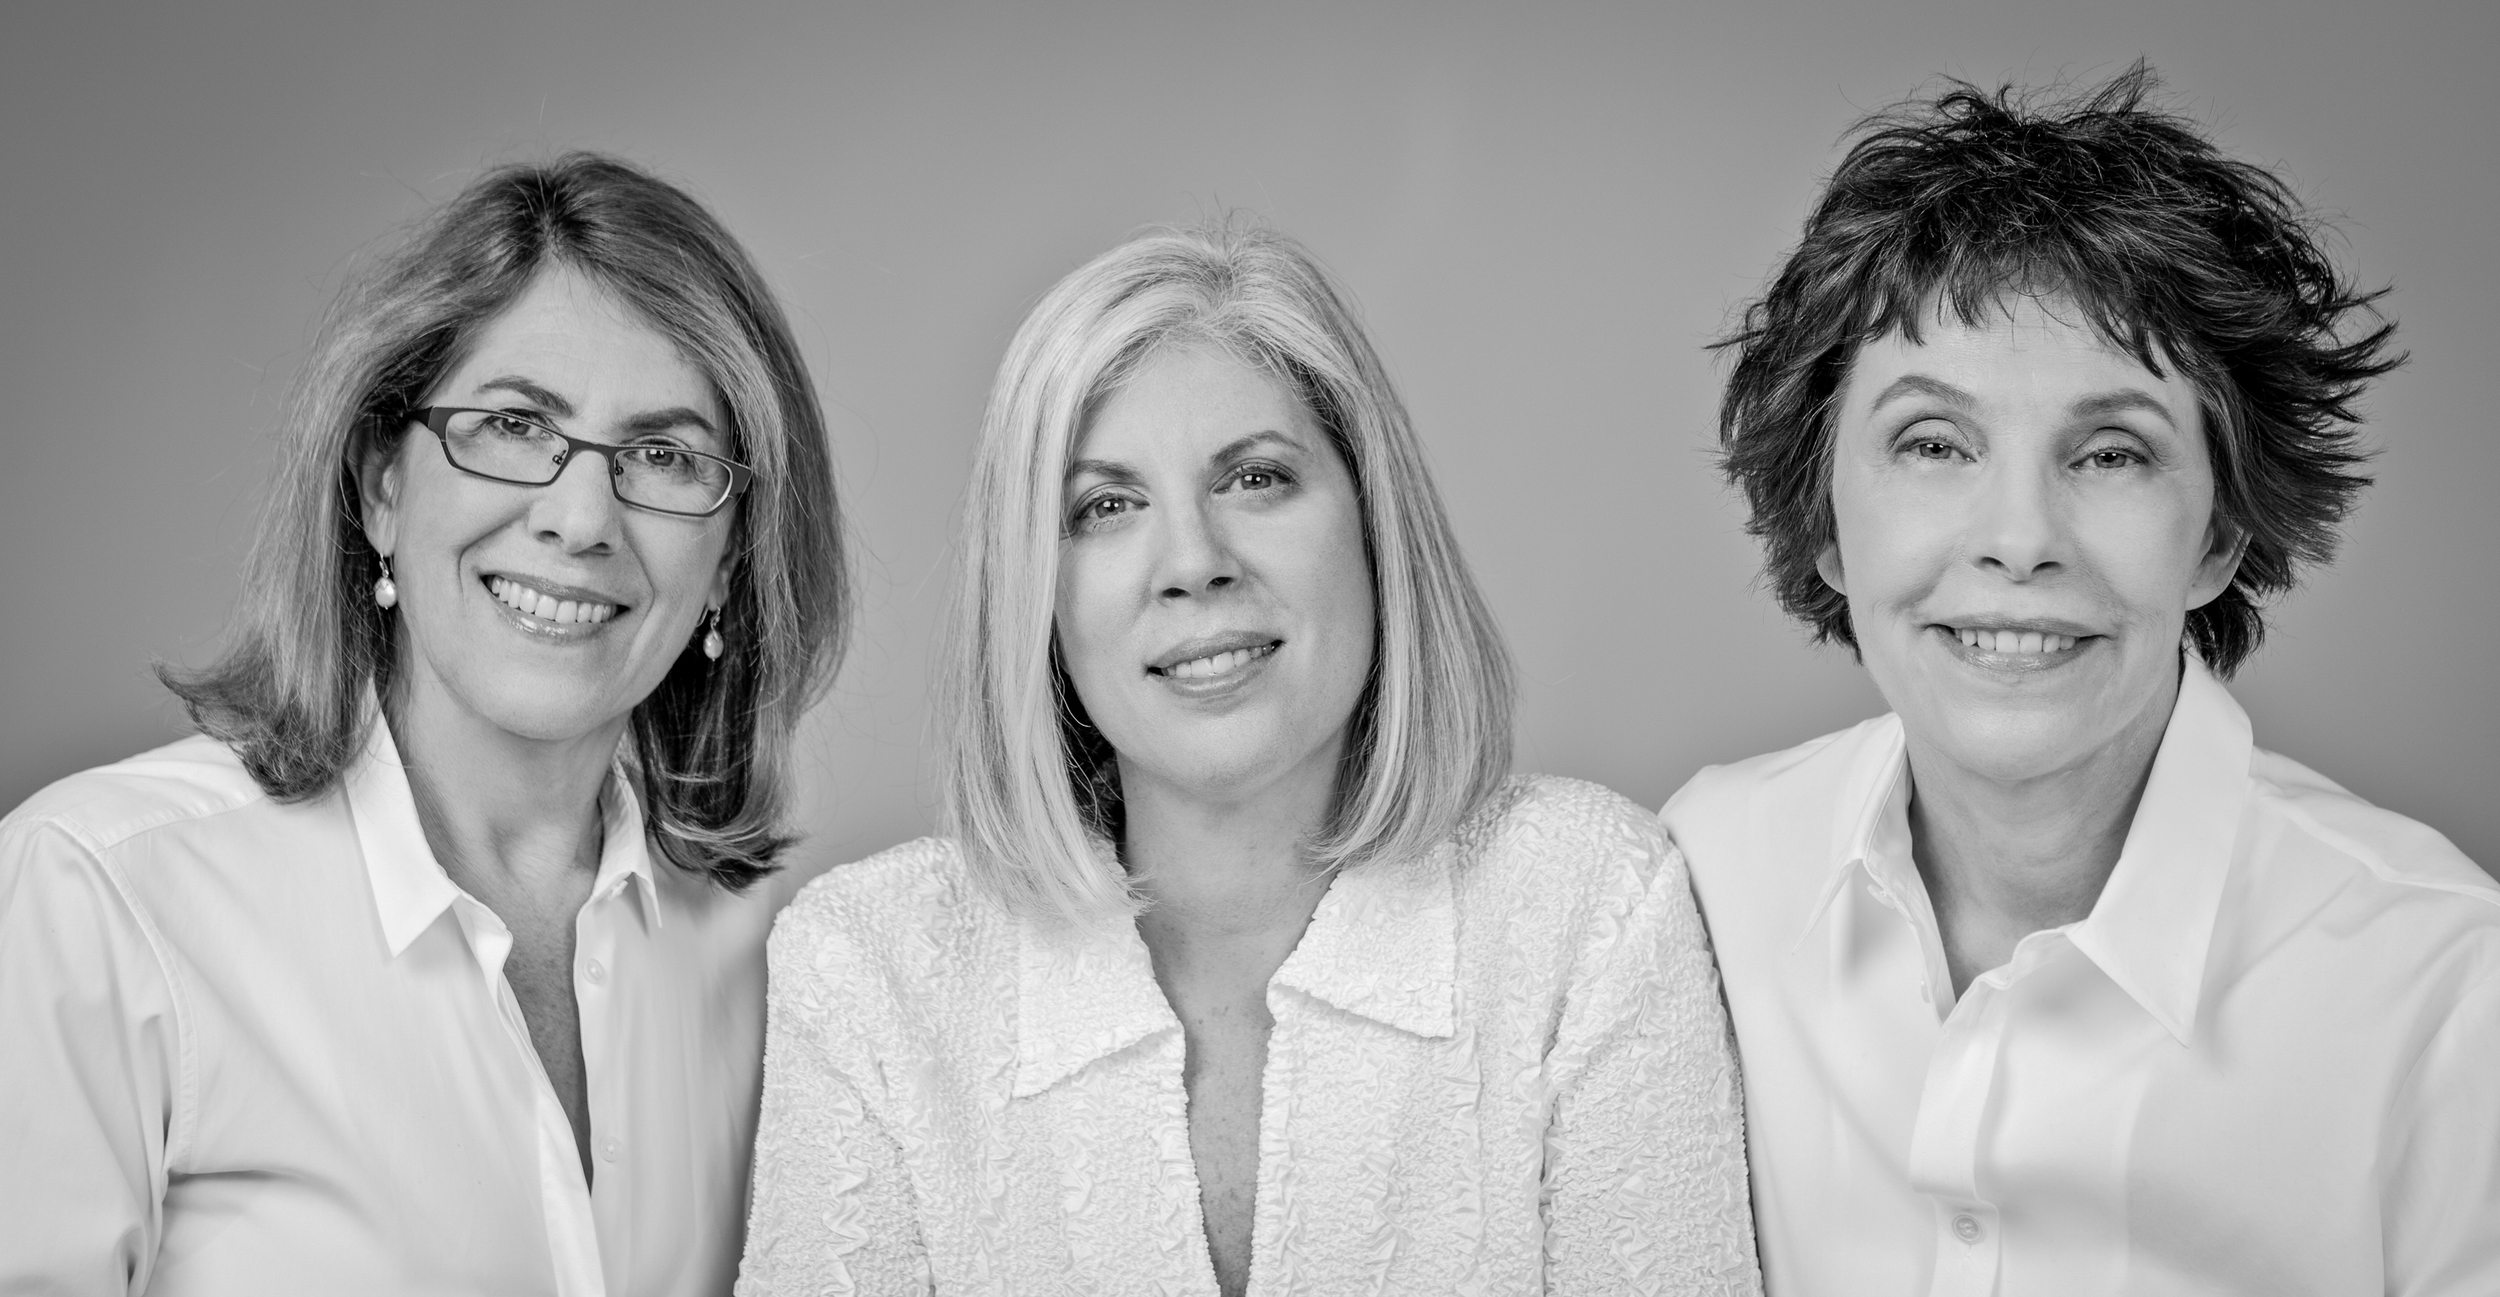 Omega Women's Leadership Center's Founders - Elizabeth Lesser, Carla Goldstein and Sarah Peter